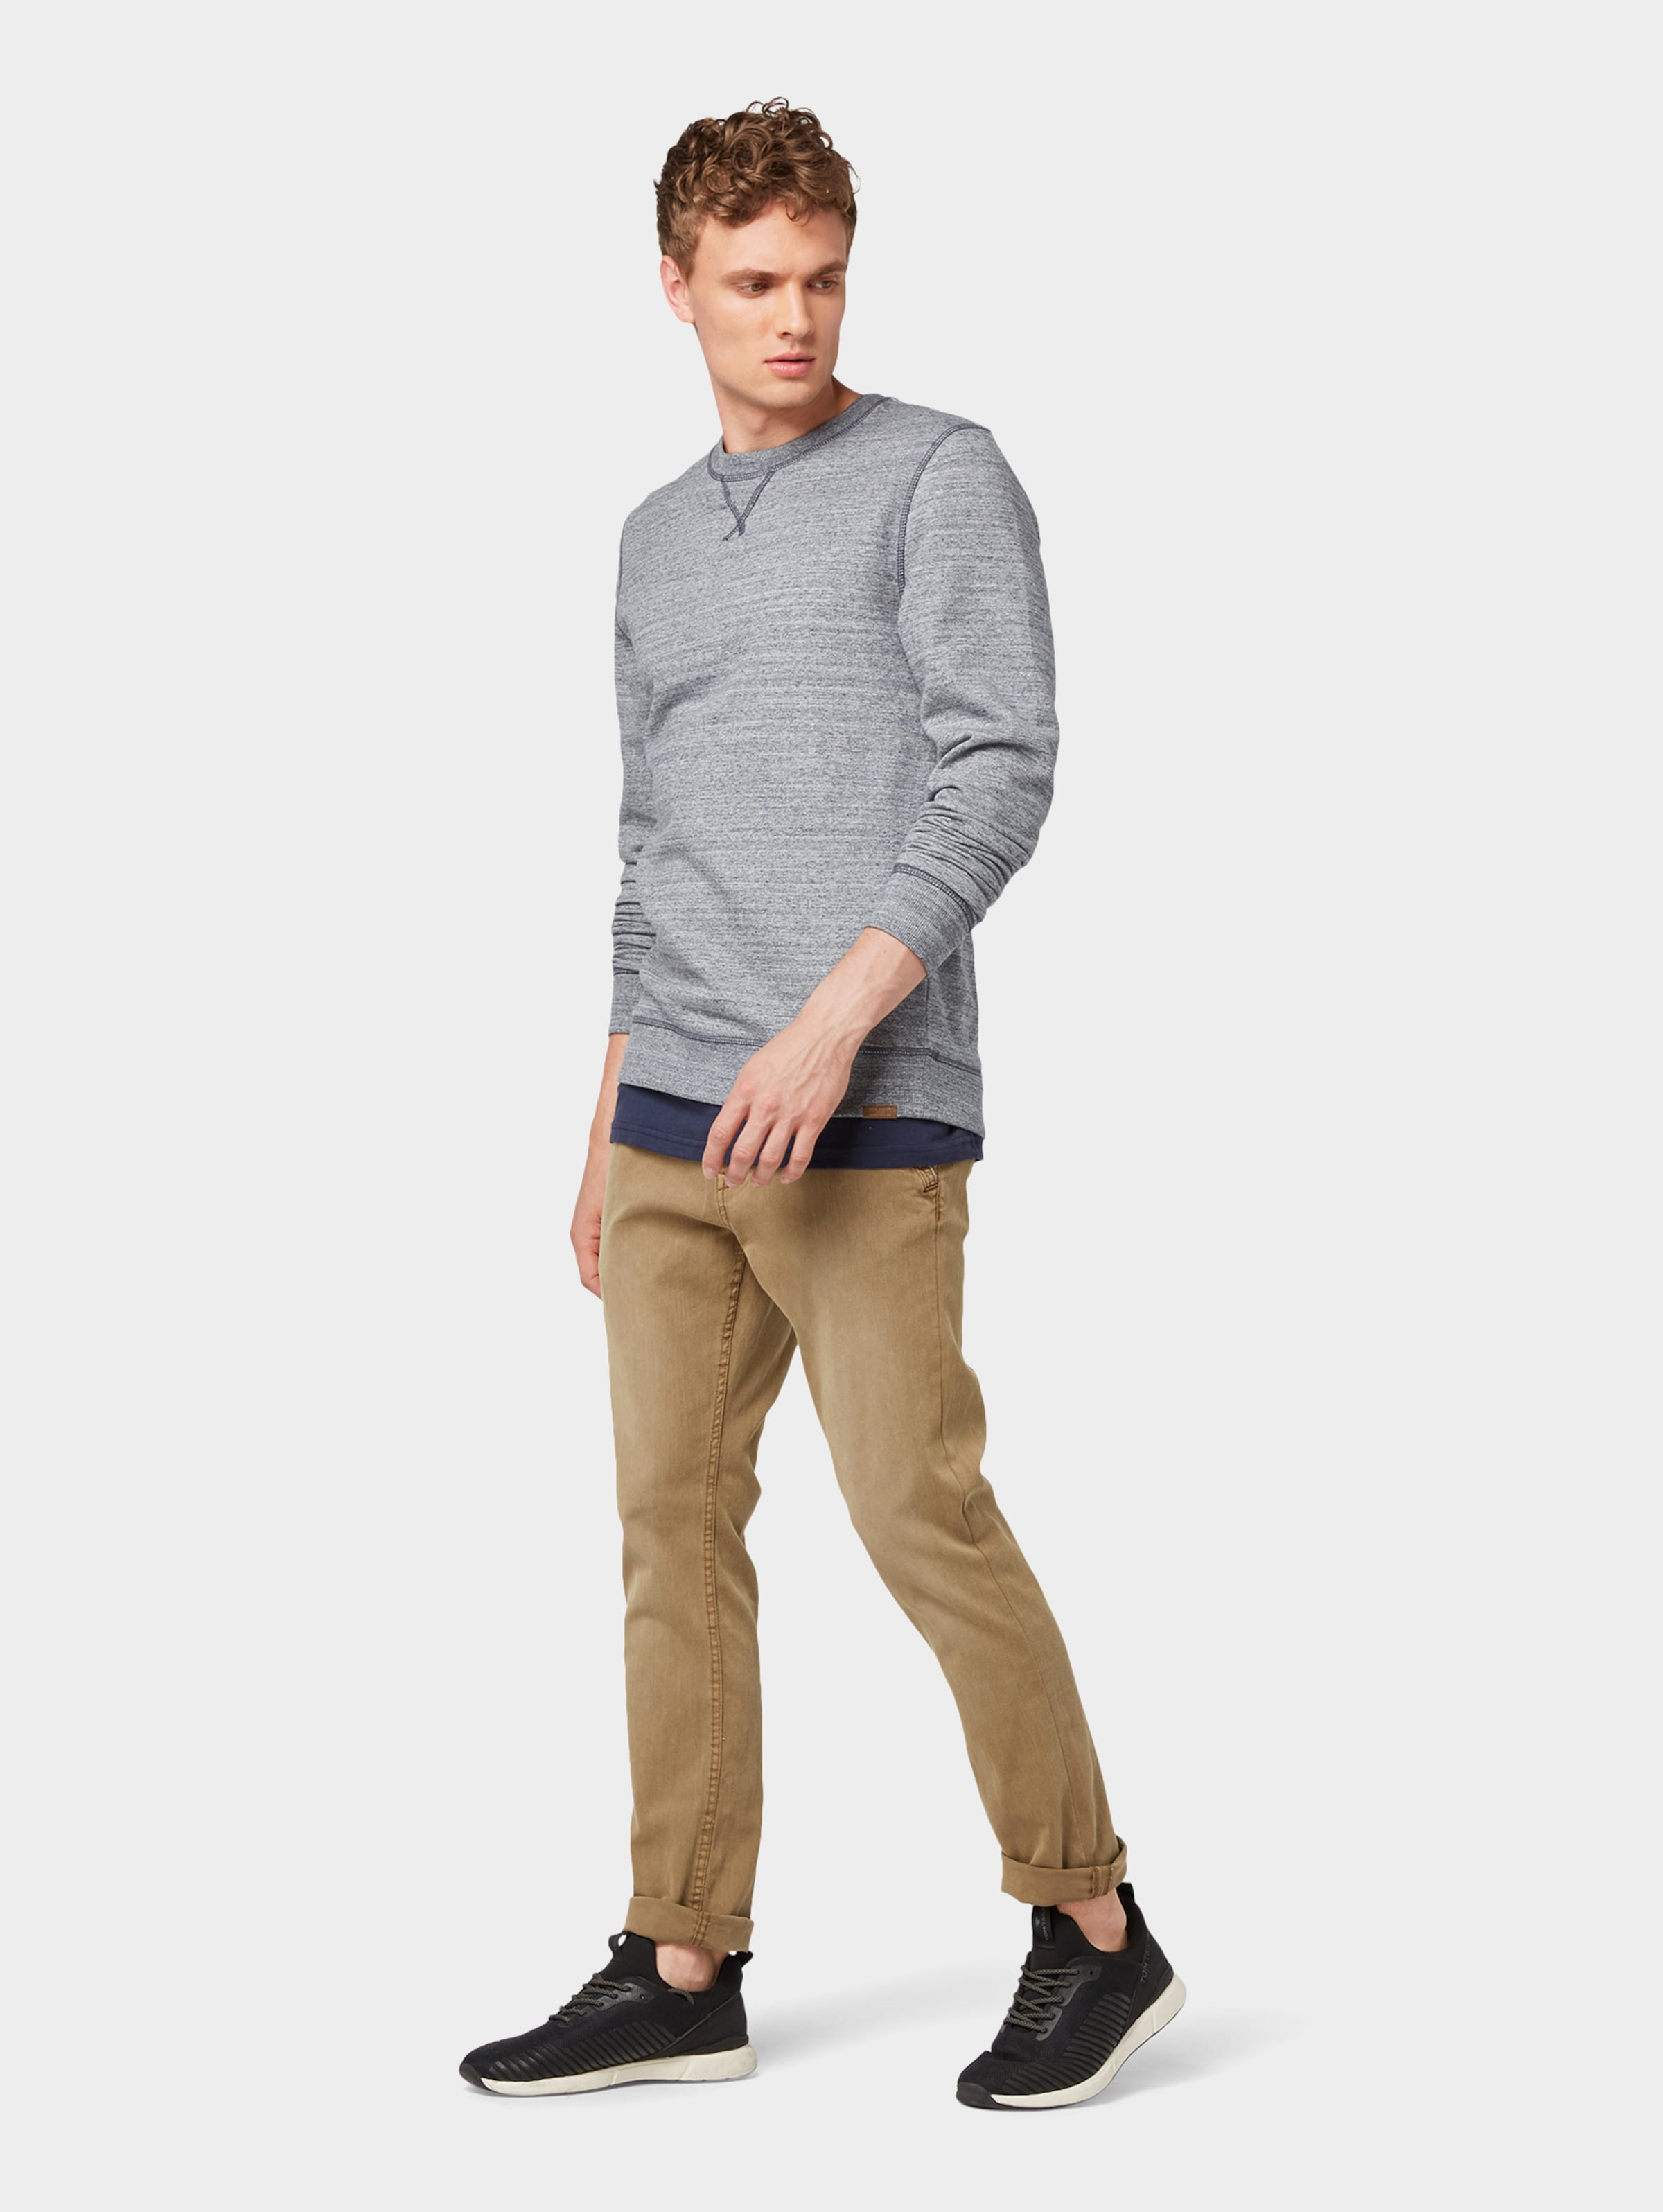 Sweatshirt In Tailor Blau Tom PZnwOXN08k